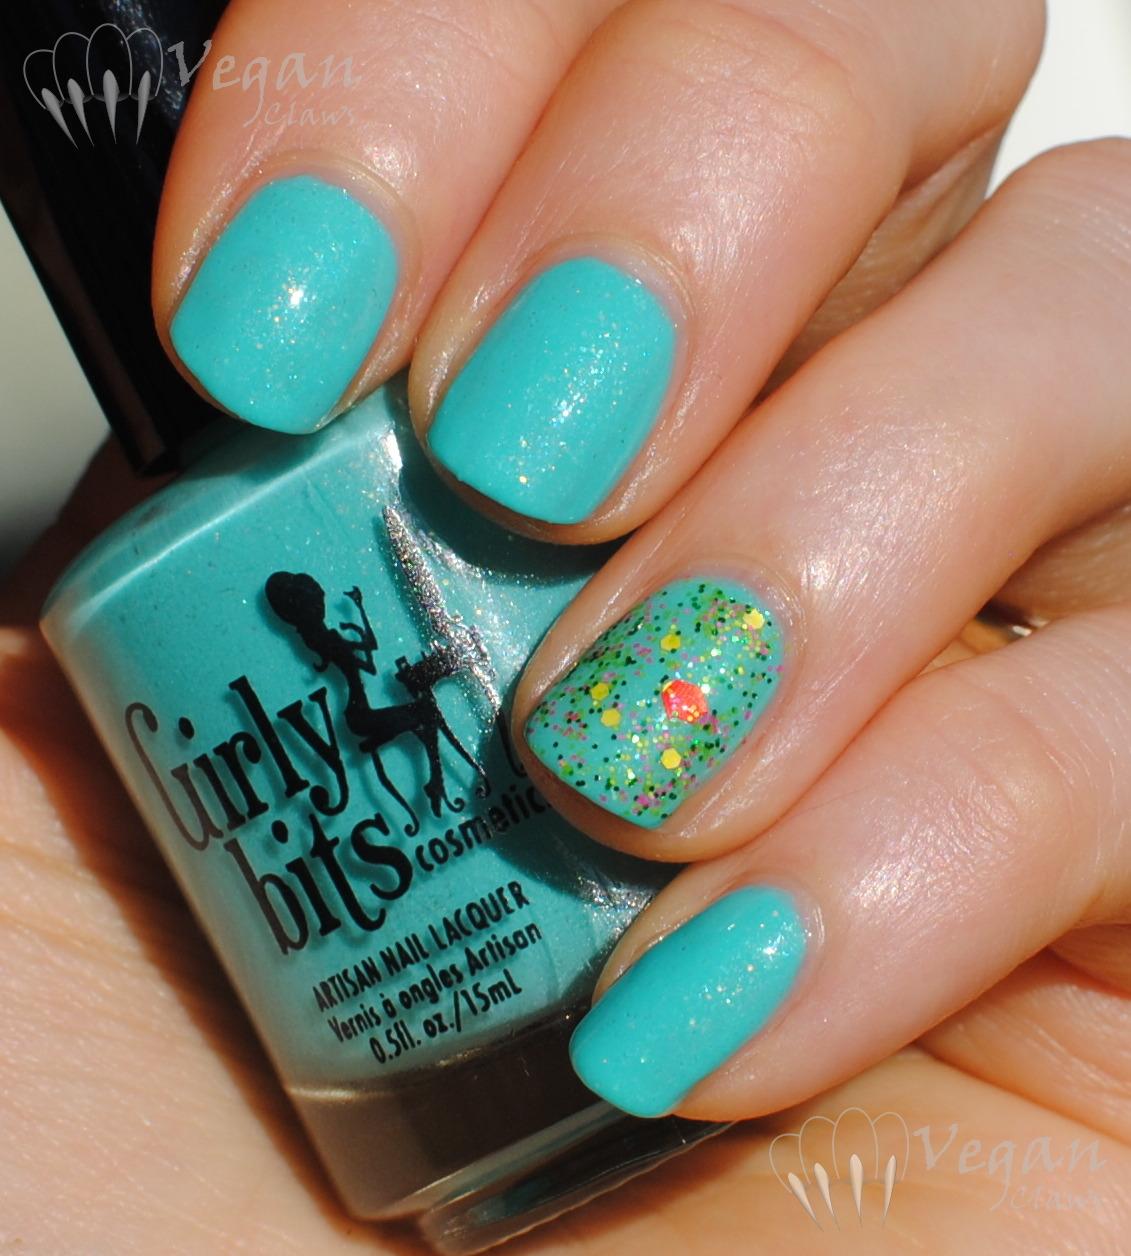 iridescent glitter | Vegan Claws